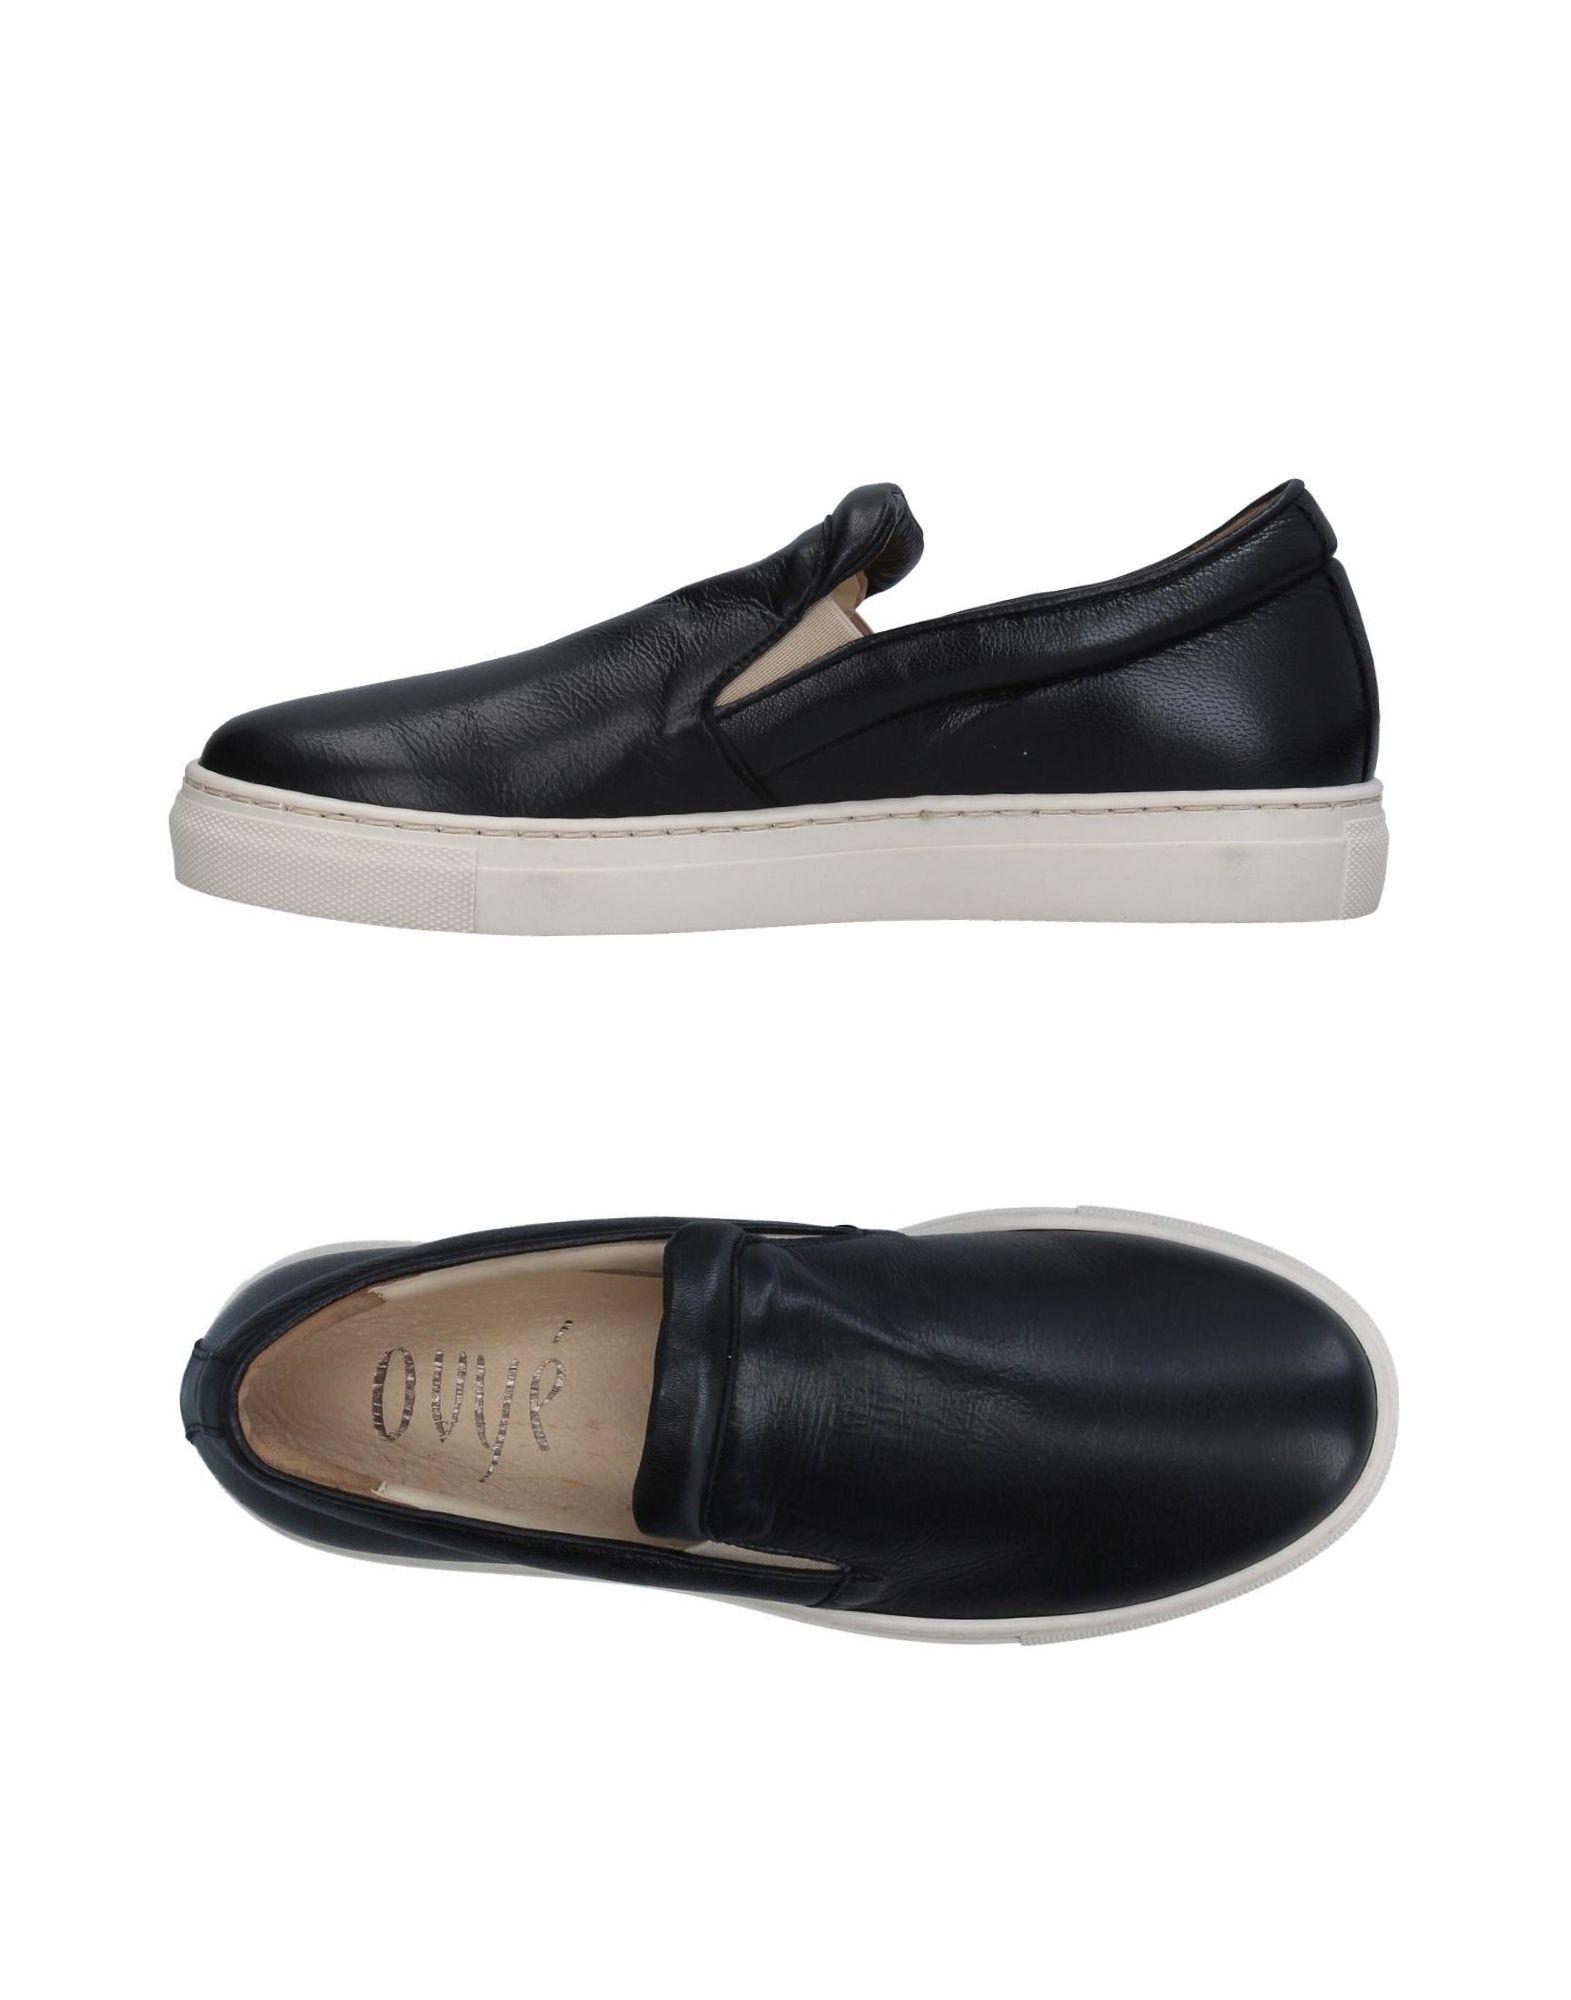 Ovye' By Cristina Lucchi Sneakers Damen  11333112WD Heiße Schuhe